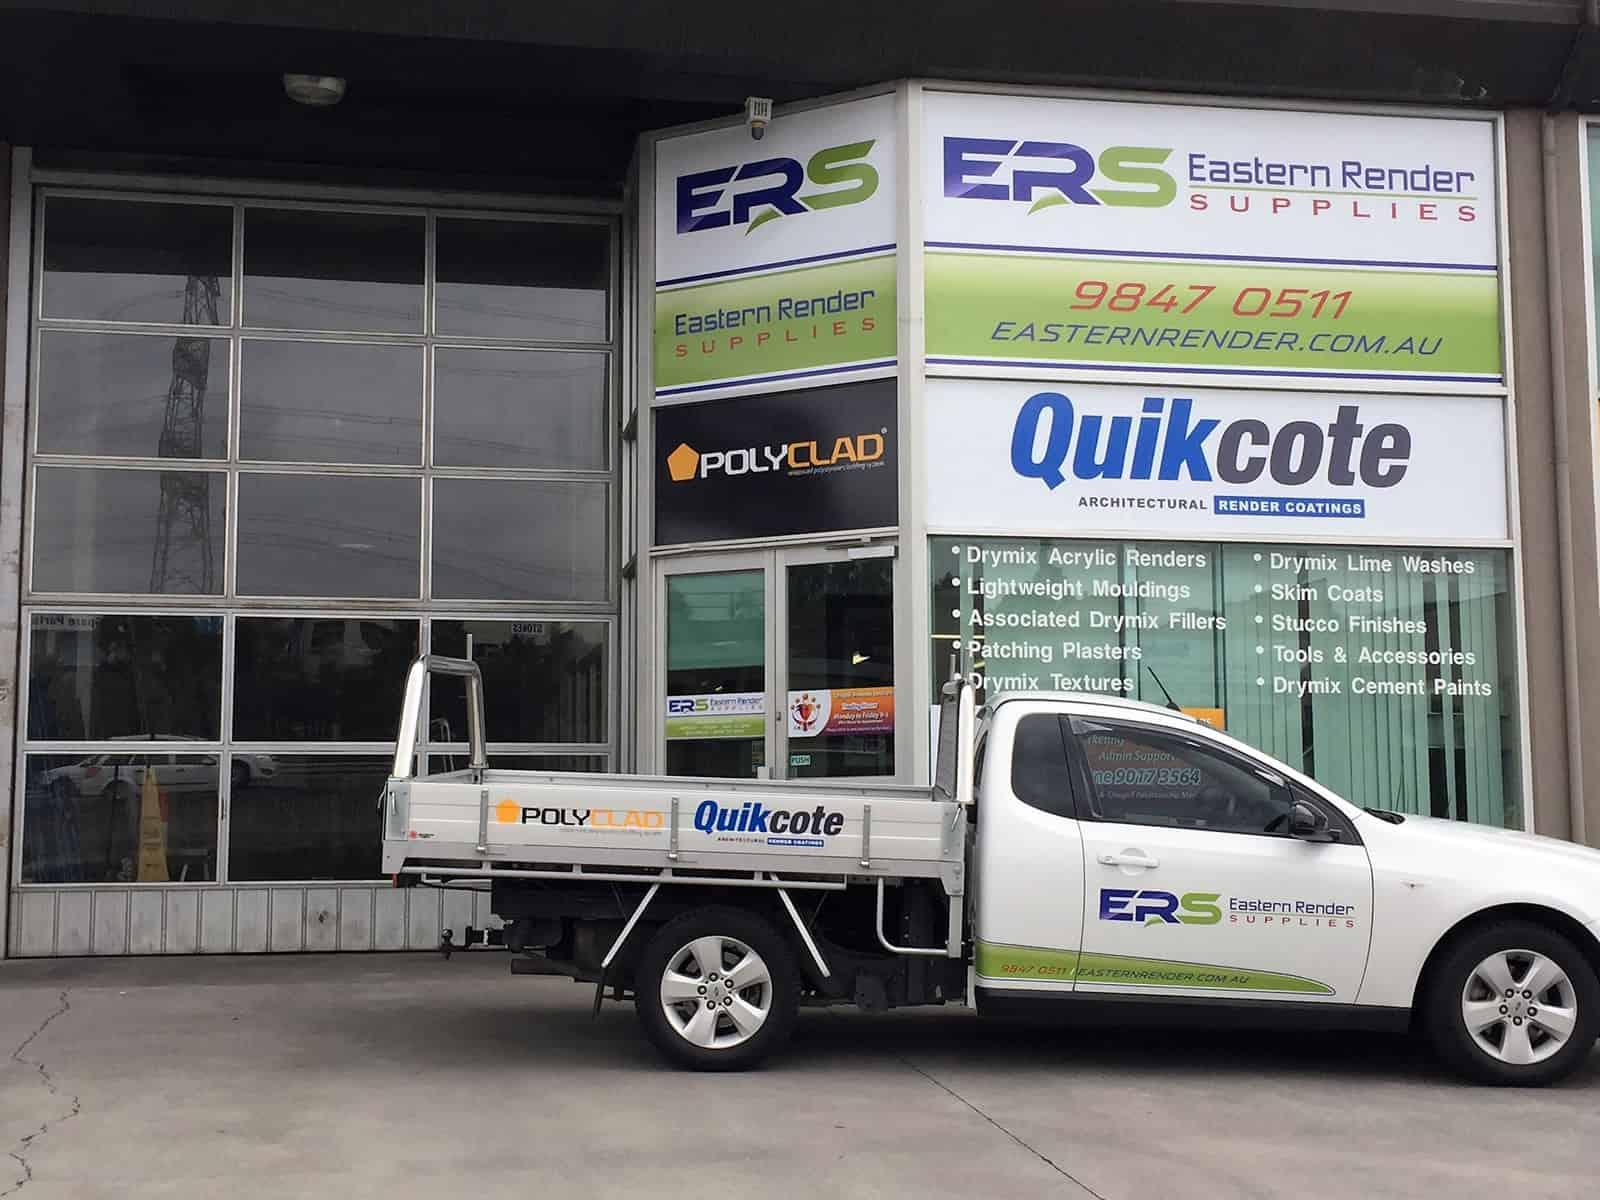 Acrylic Render Supplies Melbourne   Eastern Render Supplies